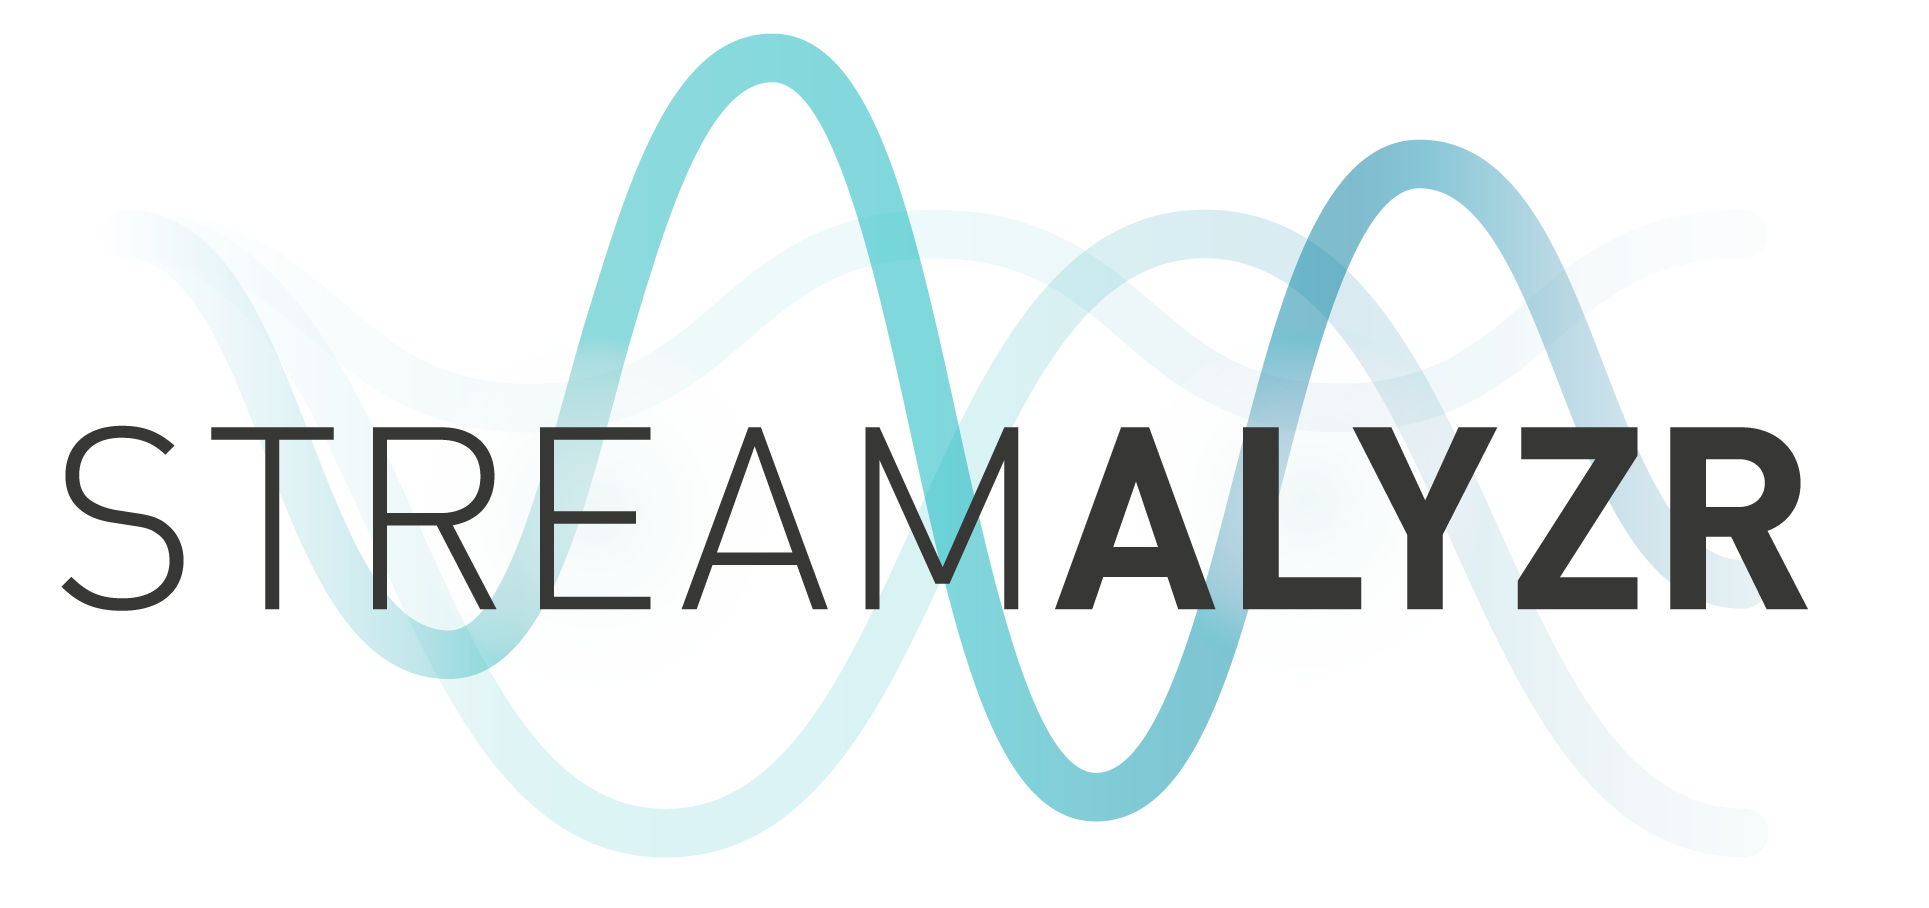 STREAMALYZR Radiostreaming Analyse Webradio Real Audience Insights